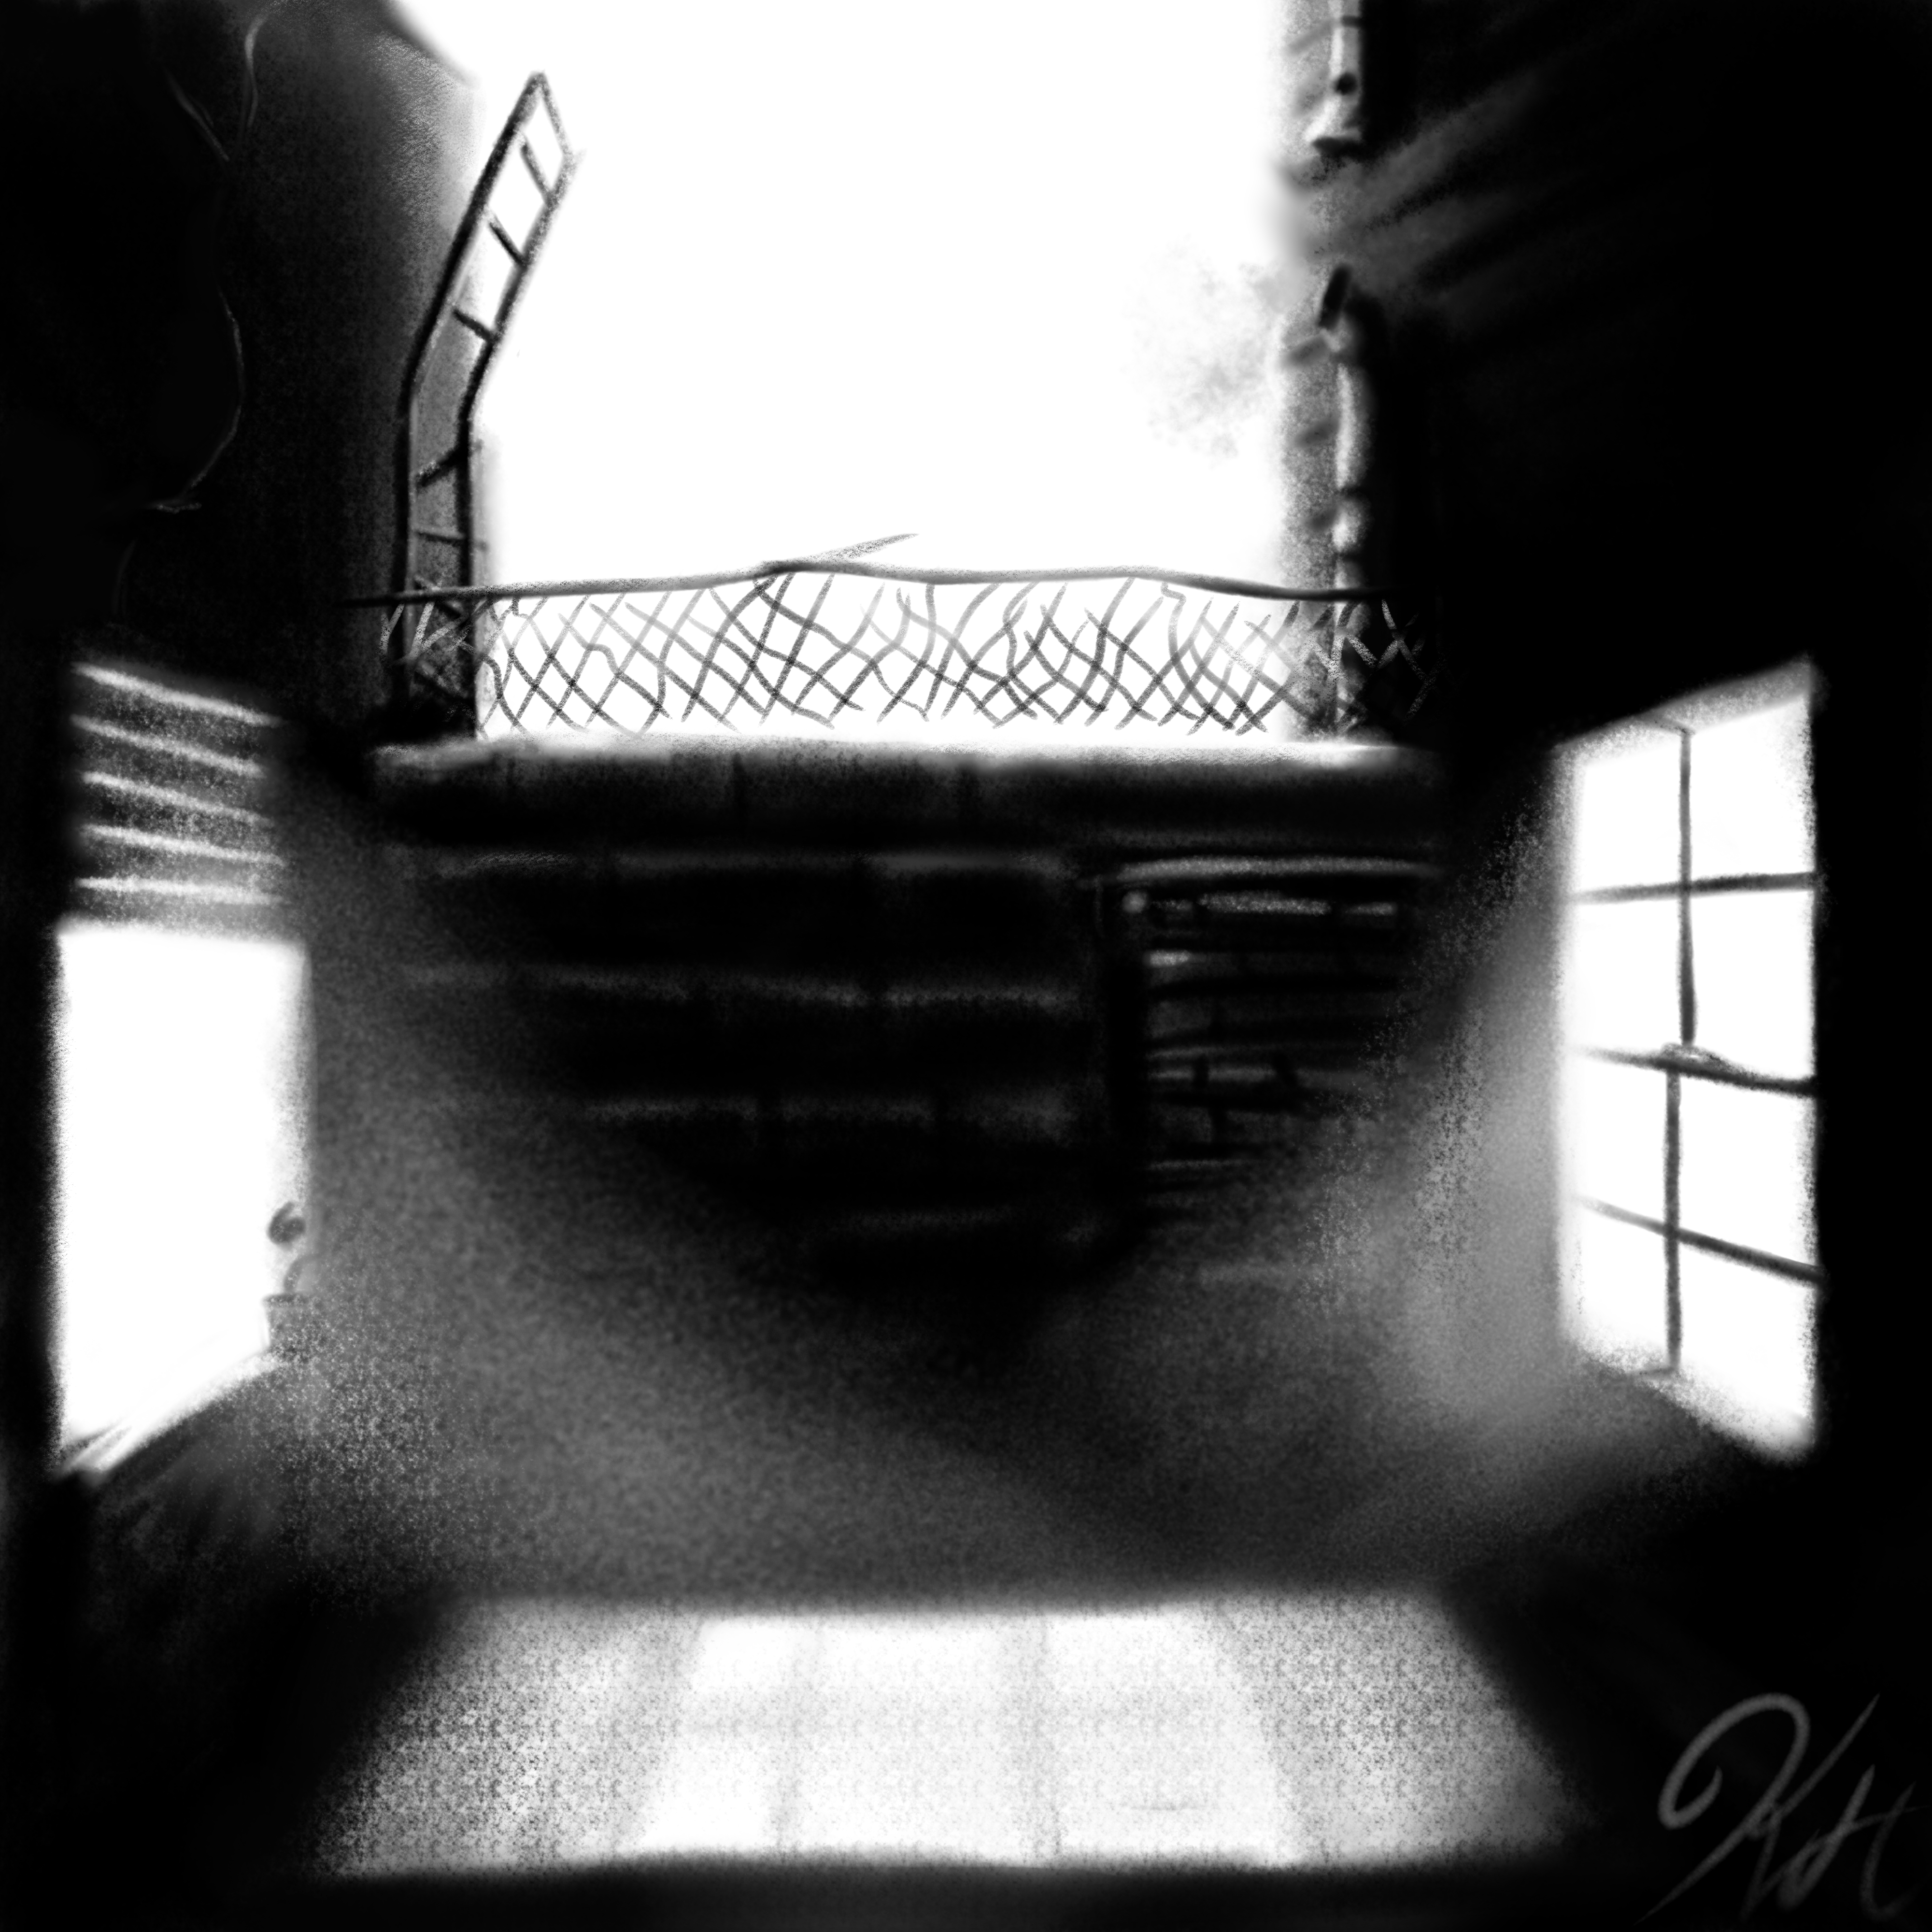 Black & White alley